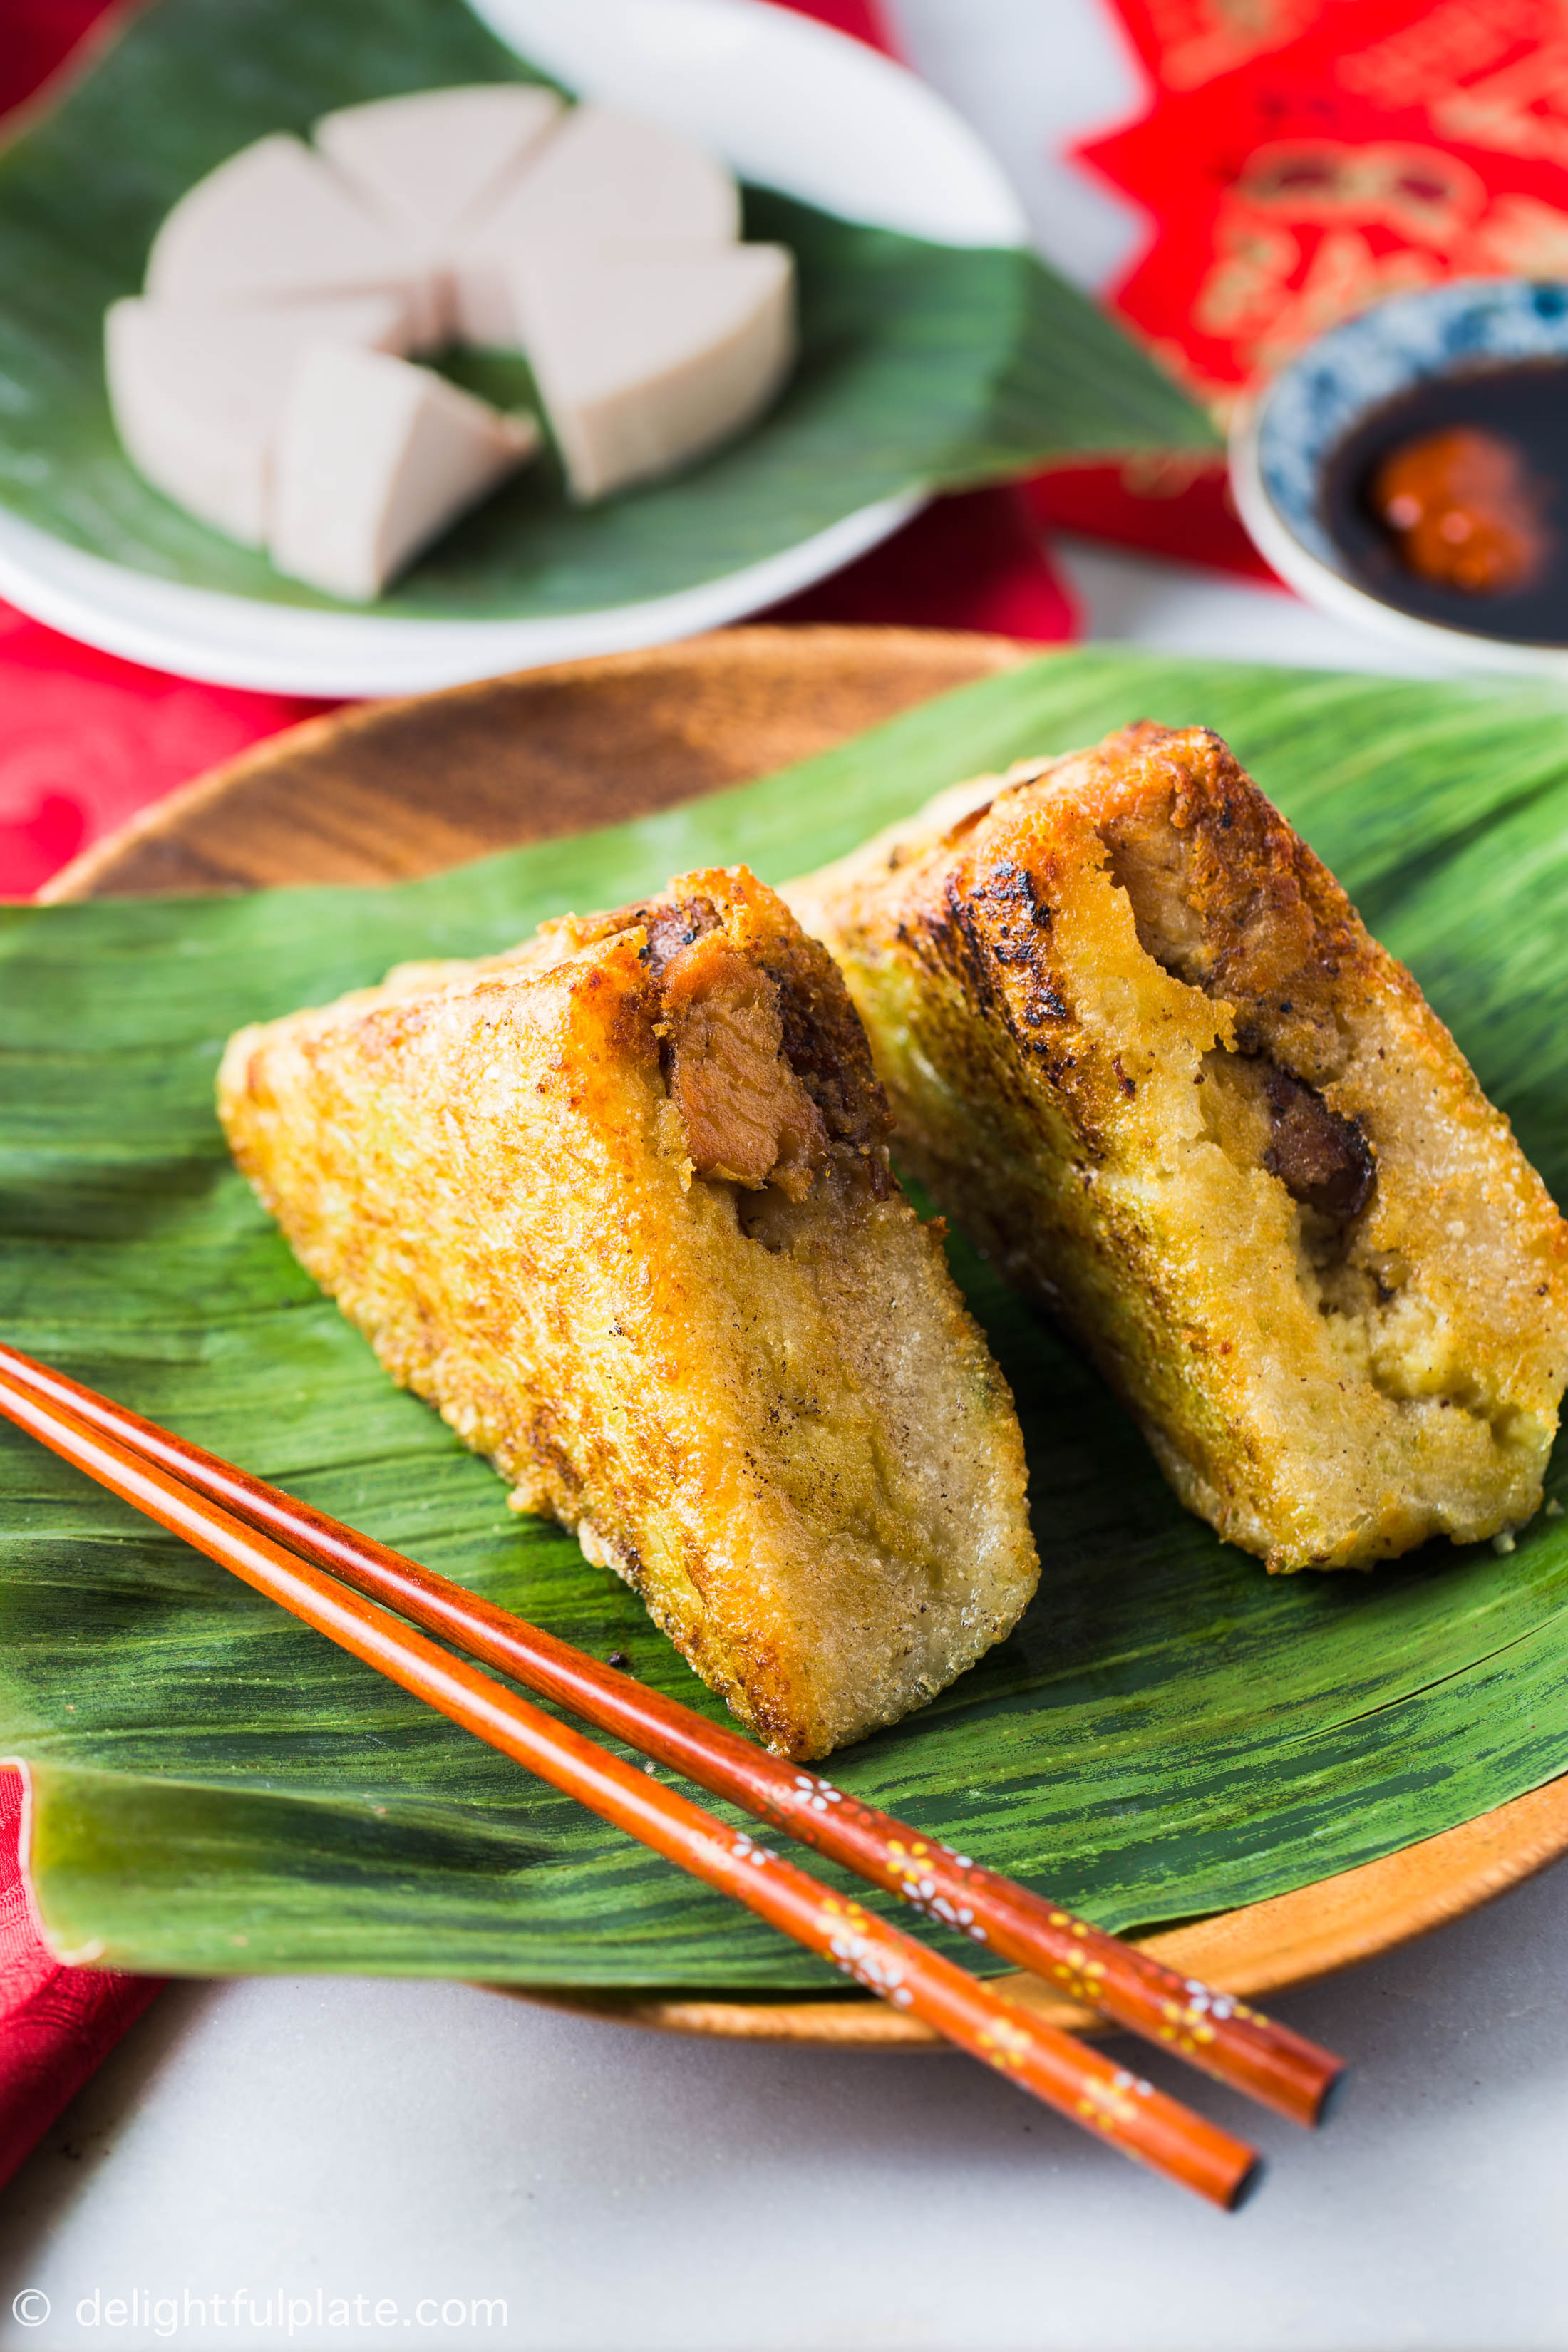 Crispy fried Vietnamese Square Sticky RIce Cake (Banh Chung)